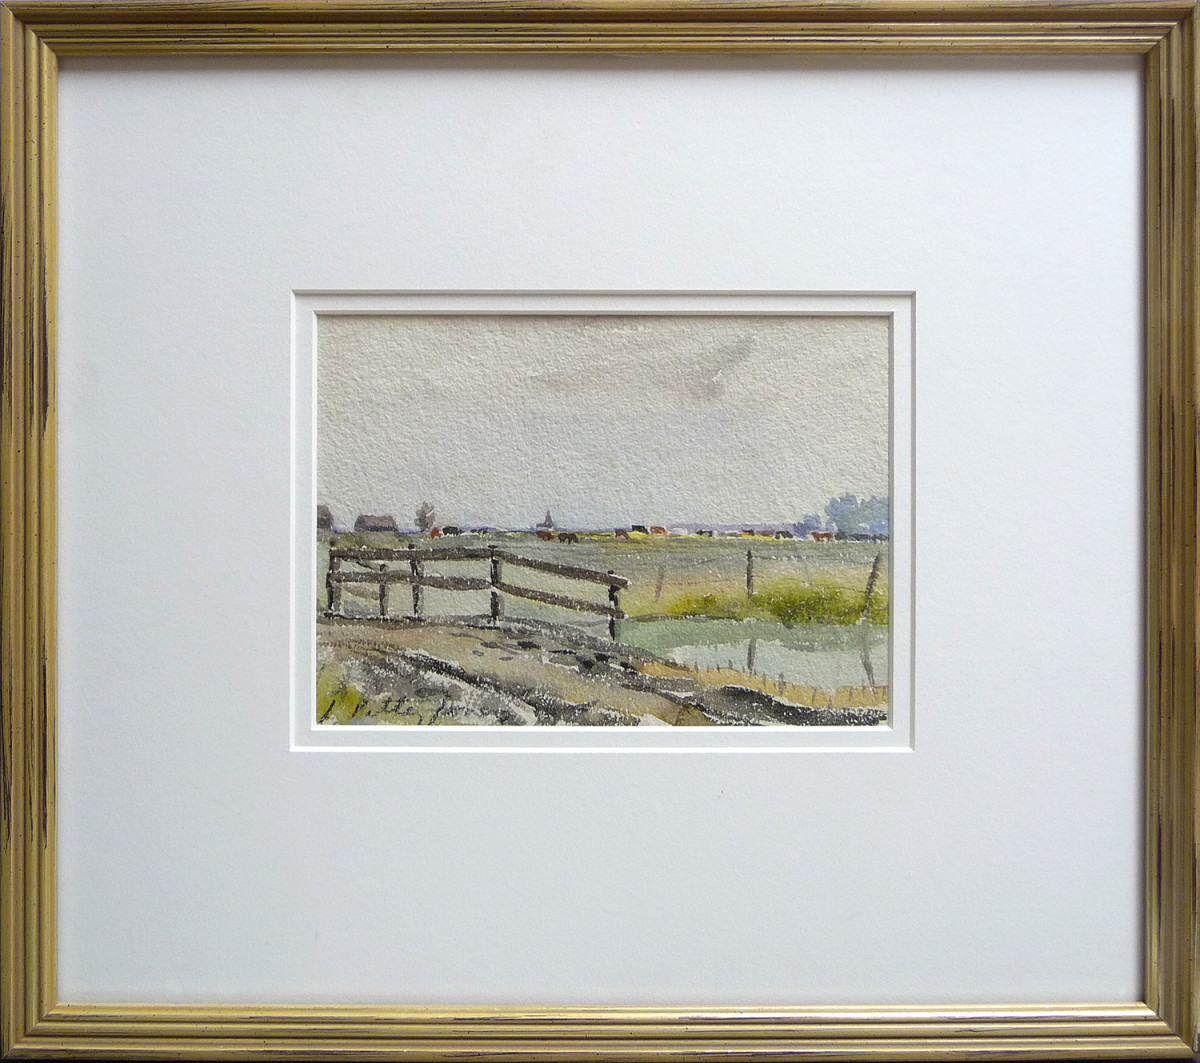 2353 - Sketch of an Old Bridge Over a Creek, June 2nd by Llewellyn Petley-Jones (1908-1986)